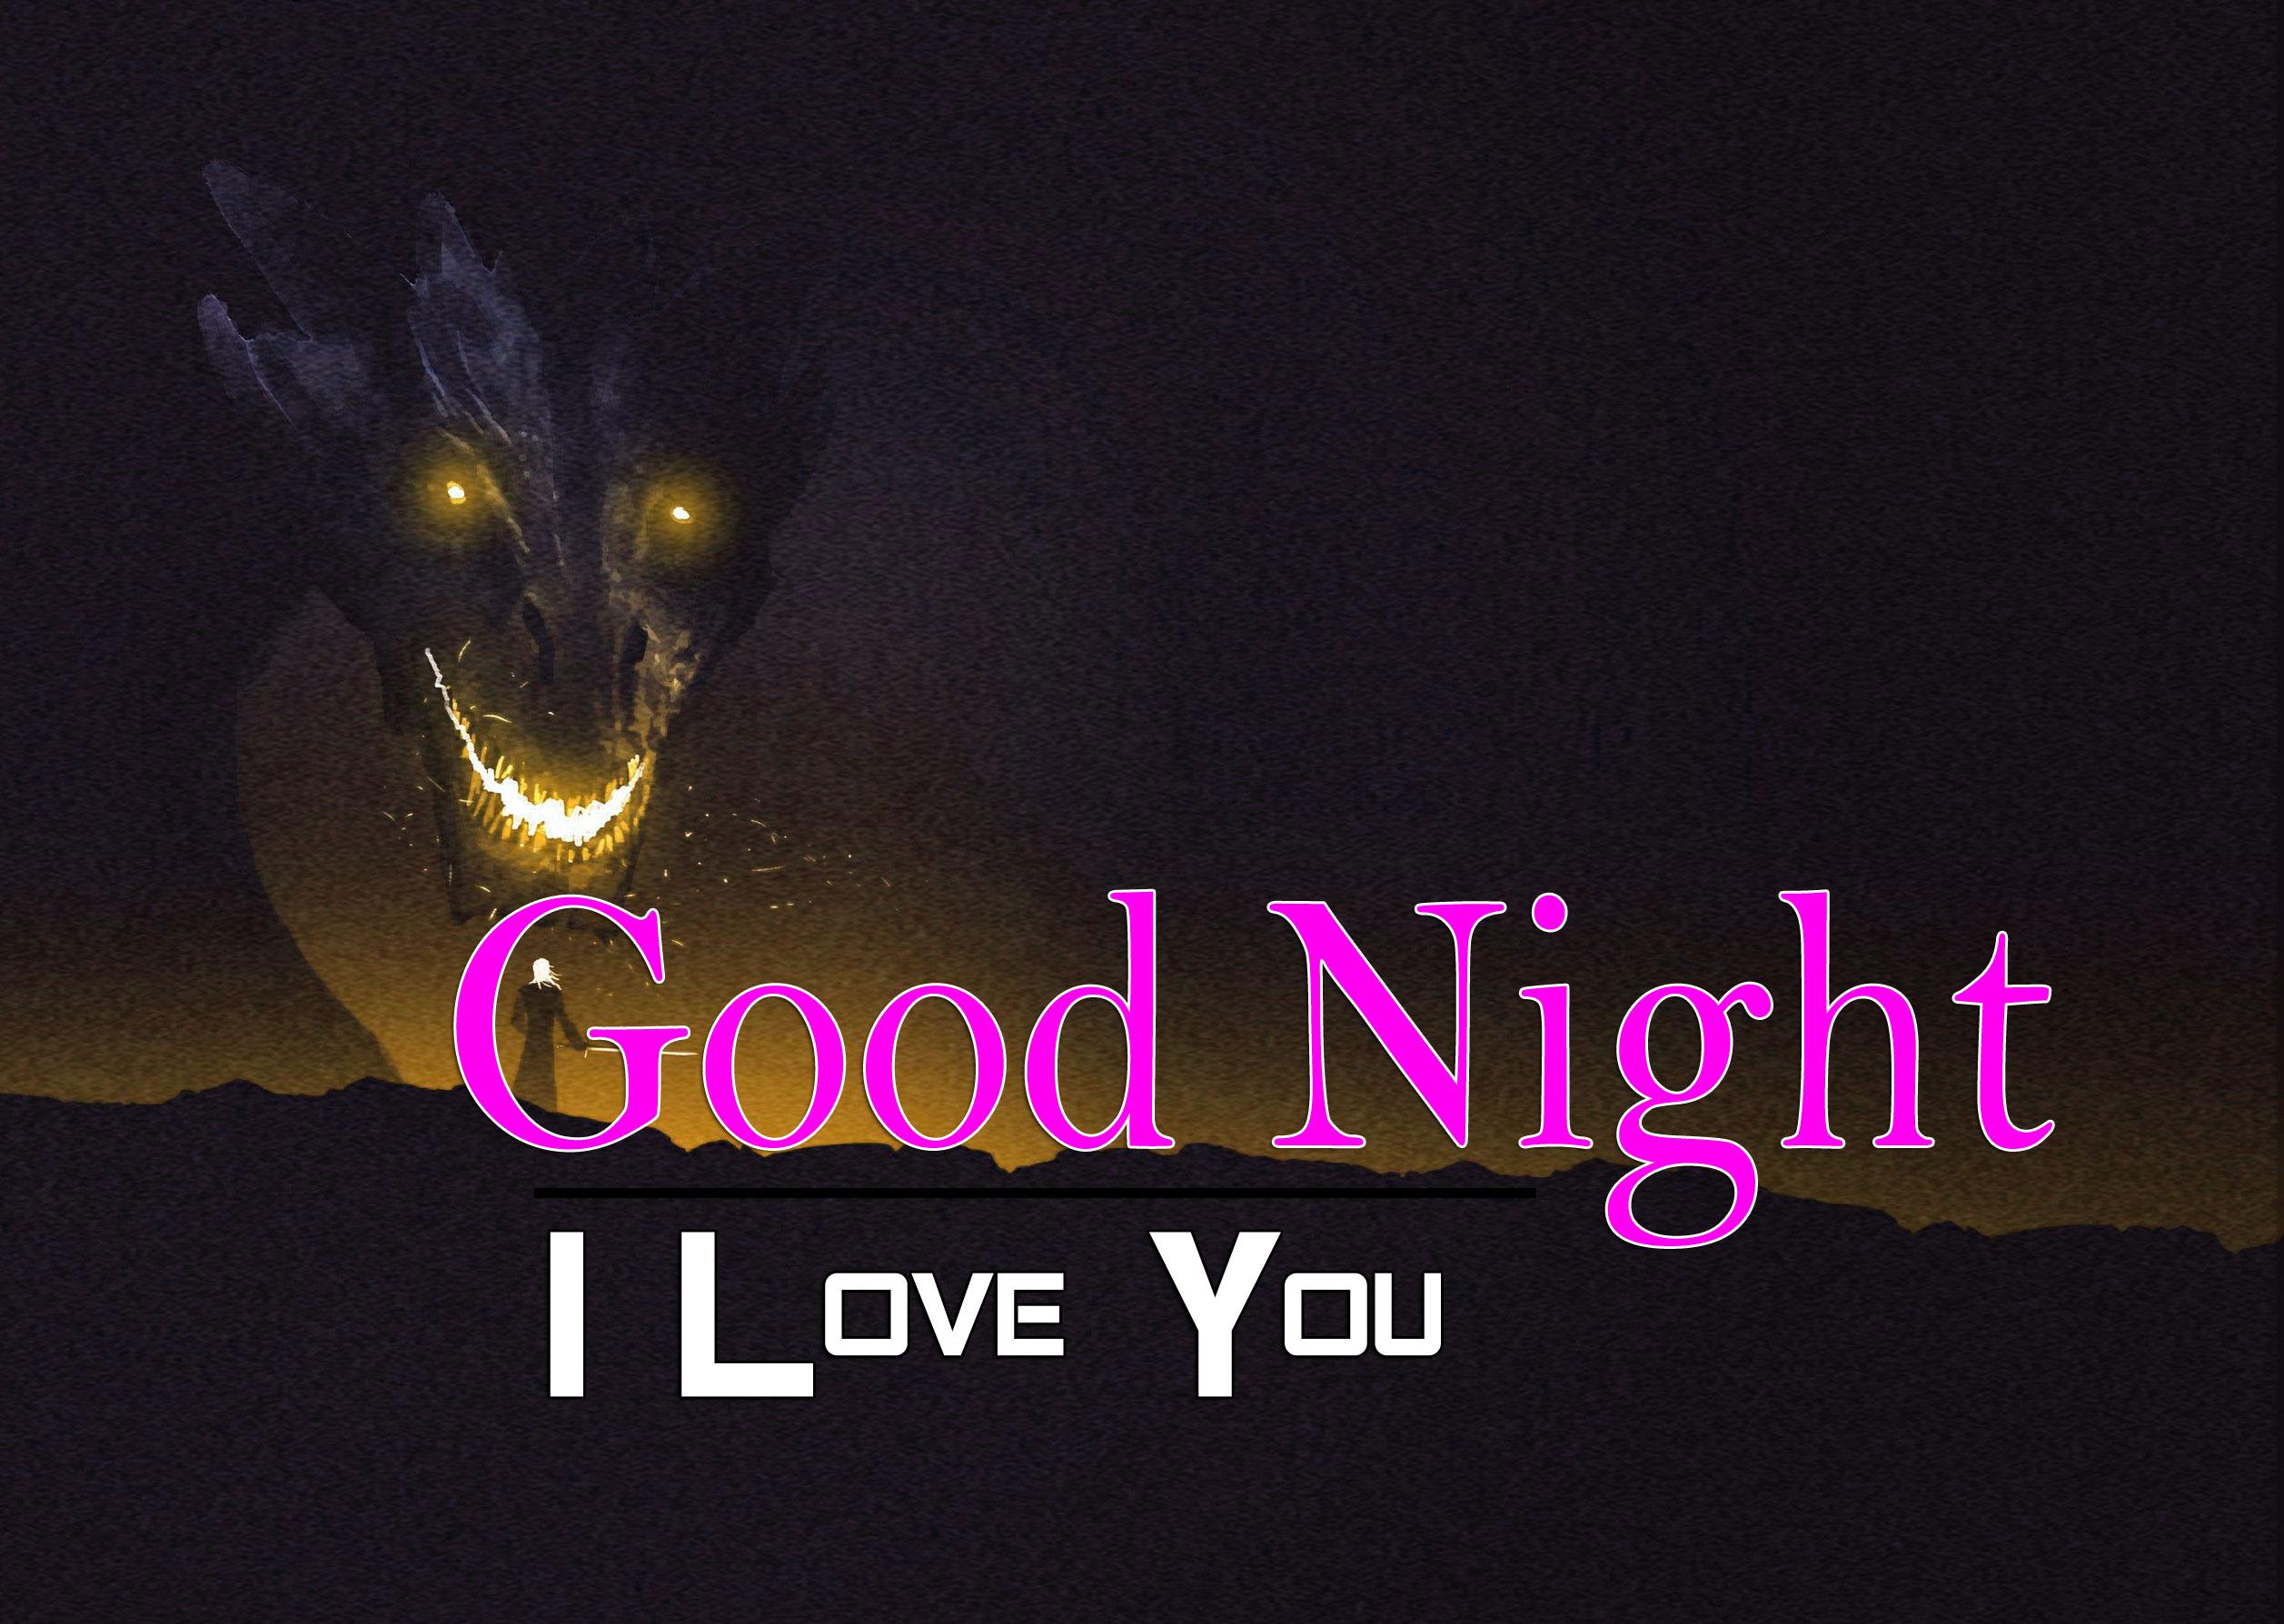 Good Night Images Wallpaper Free